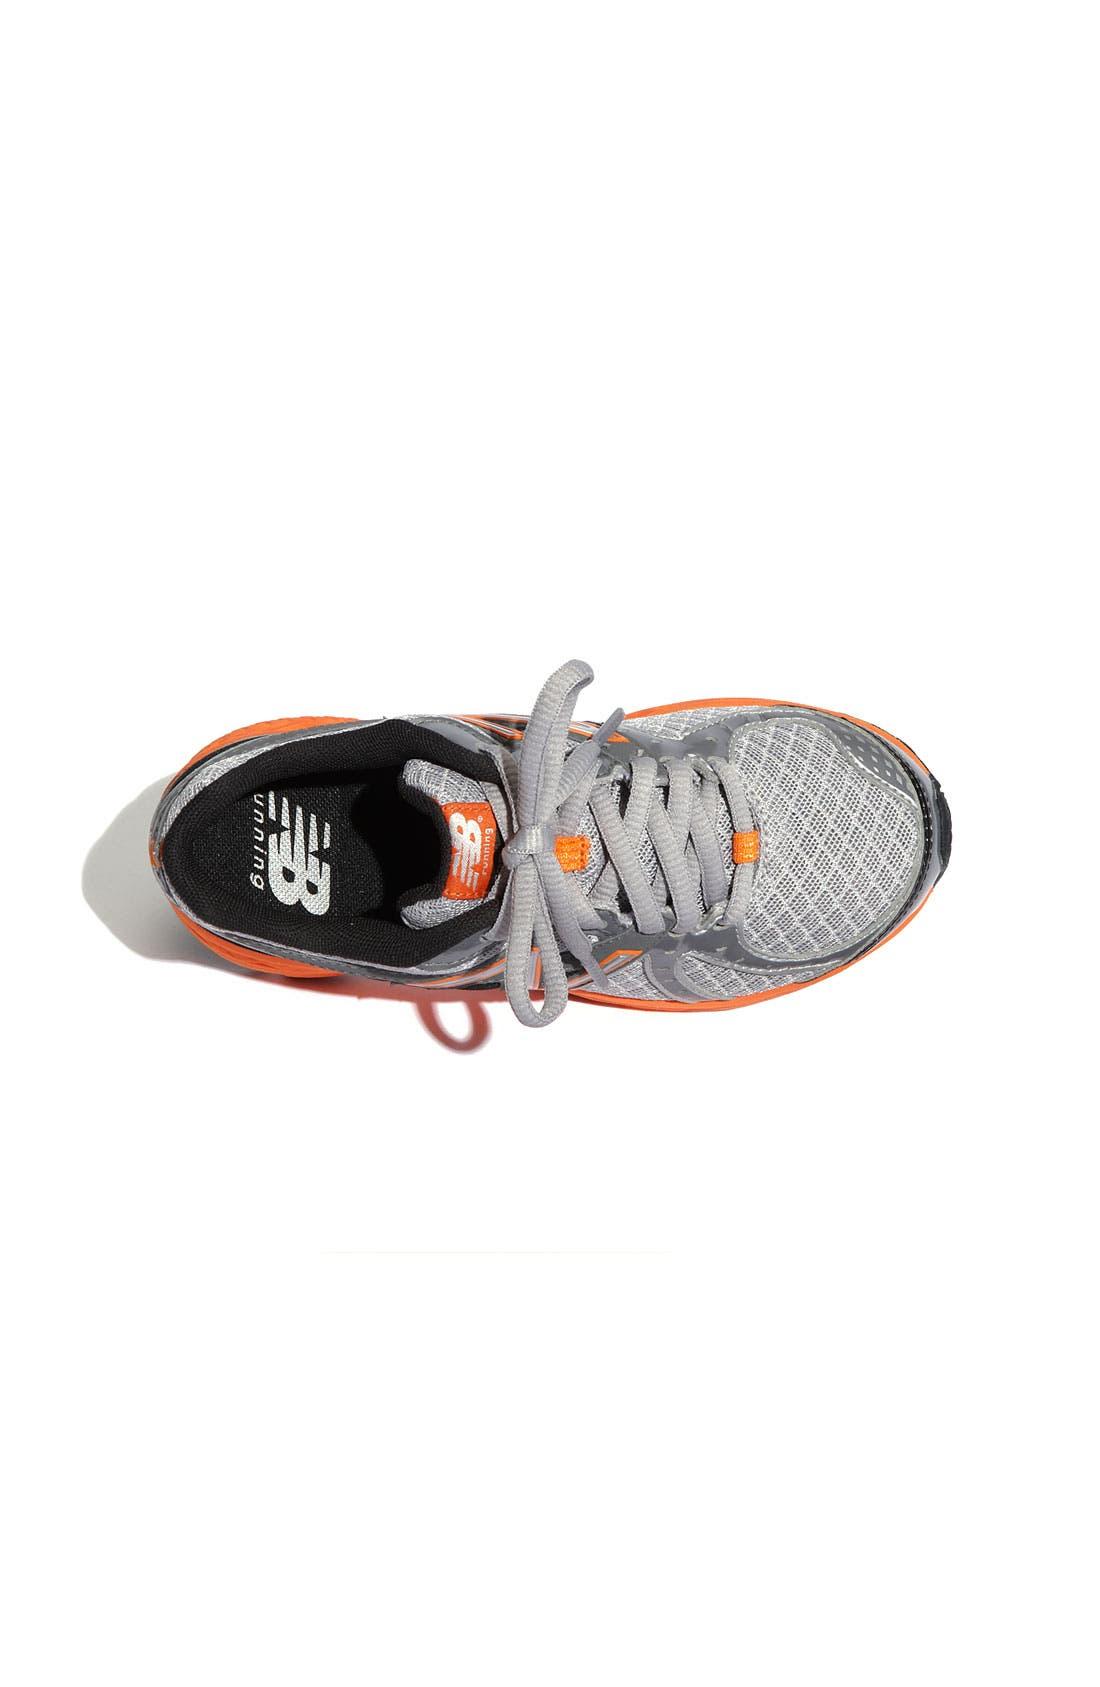 Alternate Image 3  - New Balance '790' Trail Running Shoe (Toddler, Little Kid & Big Kid)